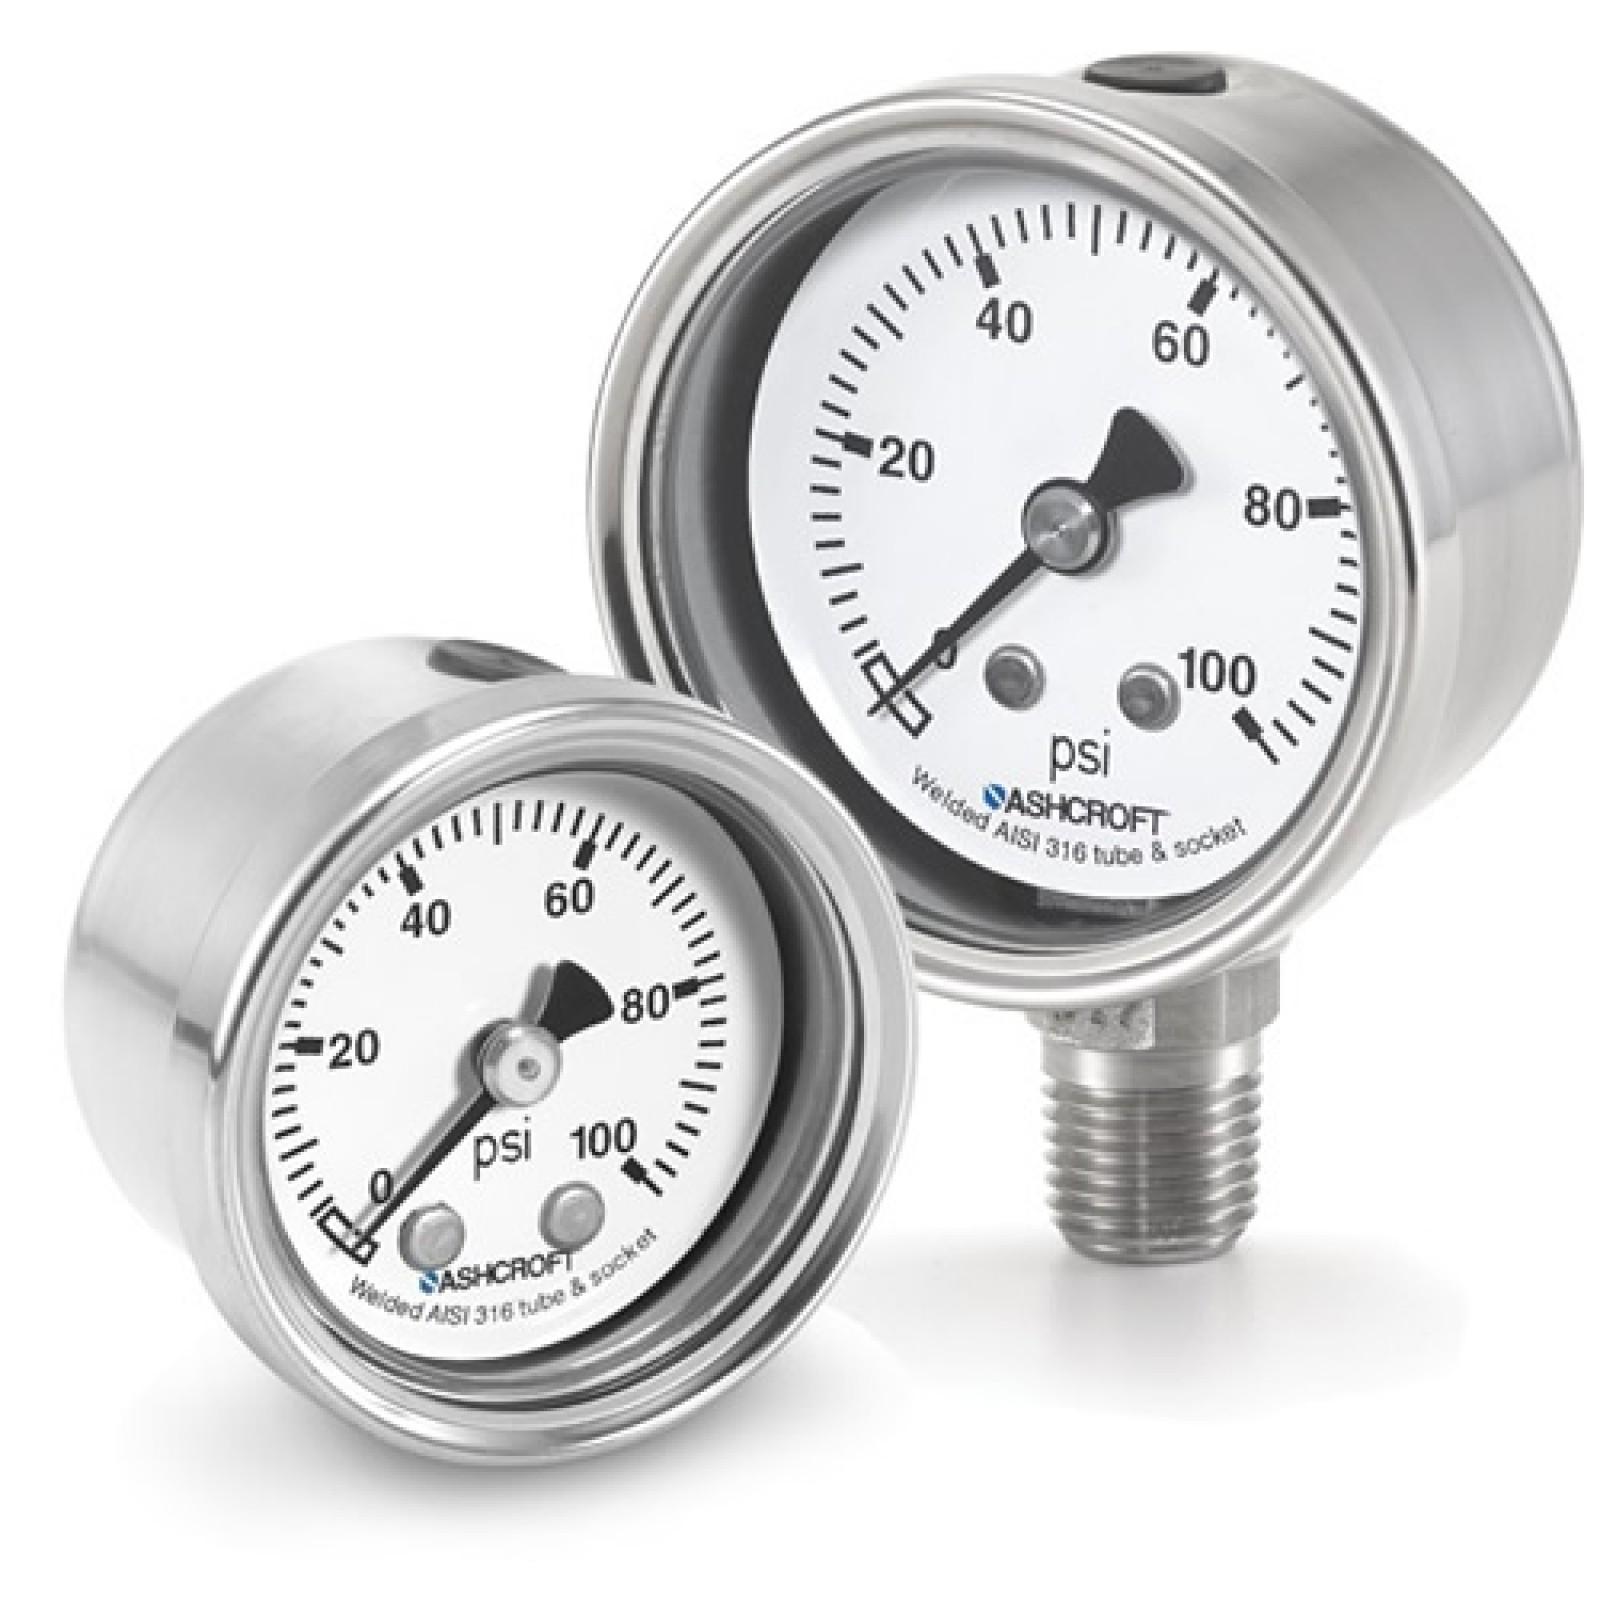 "63 1008S 02L XLL 7500#/KP - Pressure Gauge, 63mm stainless 1/4"" NPT Lower conn & Case, Plus Performance 0/7500 psi"